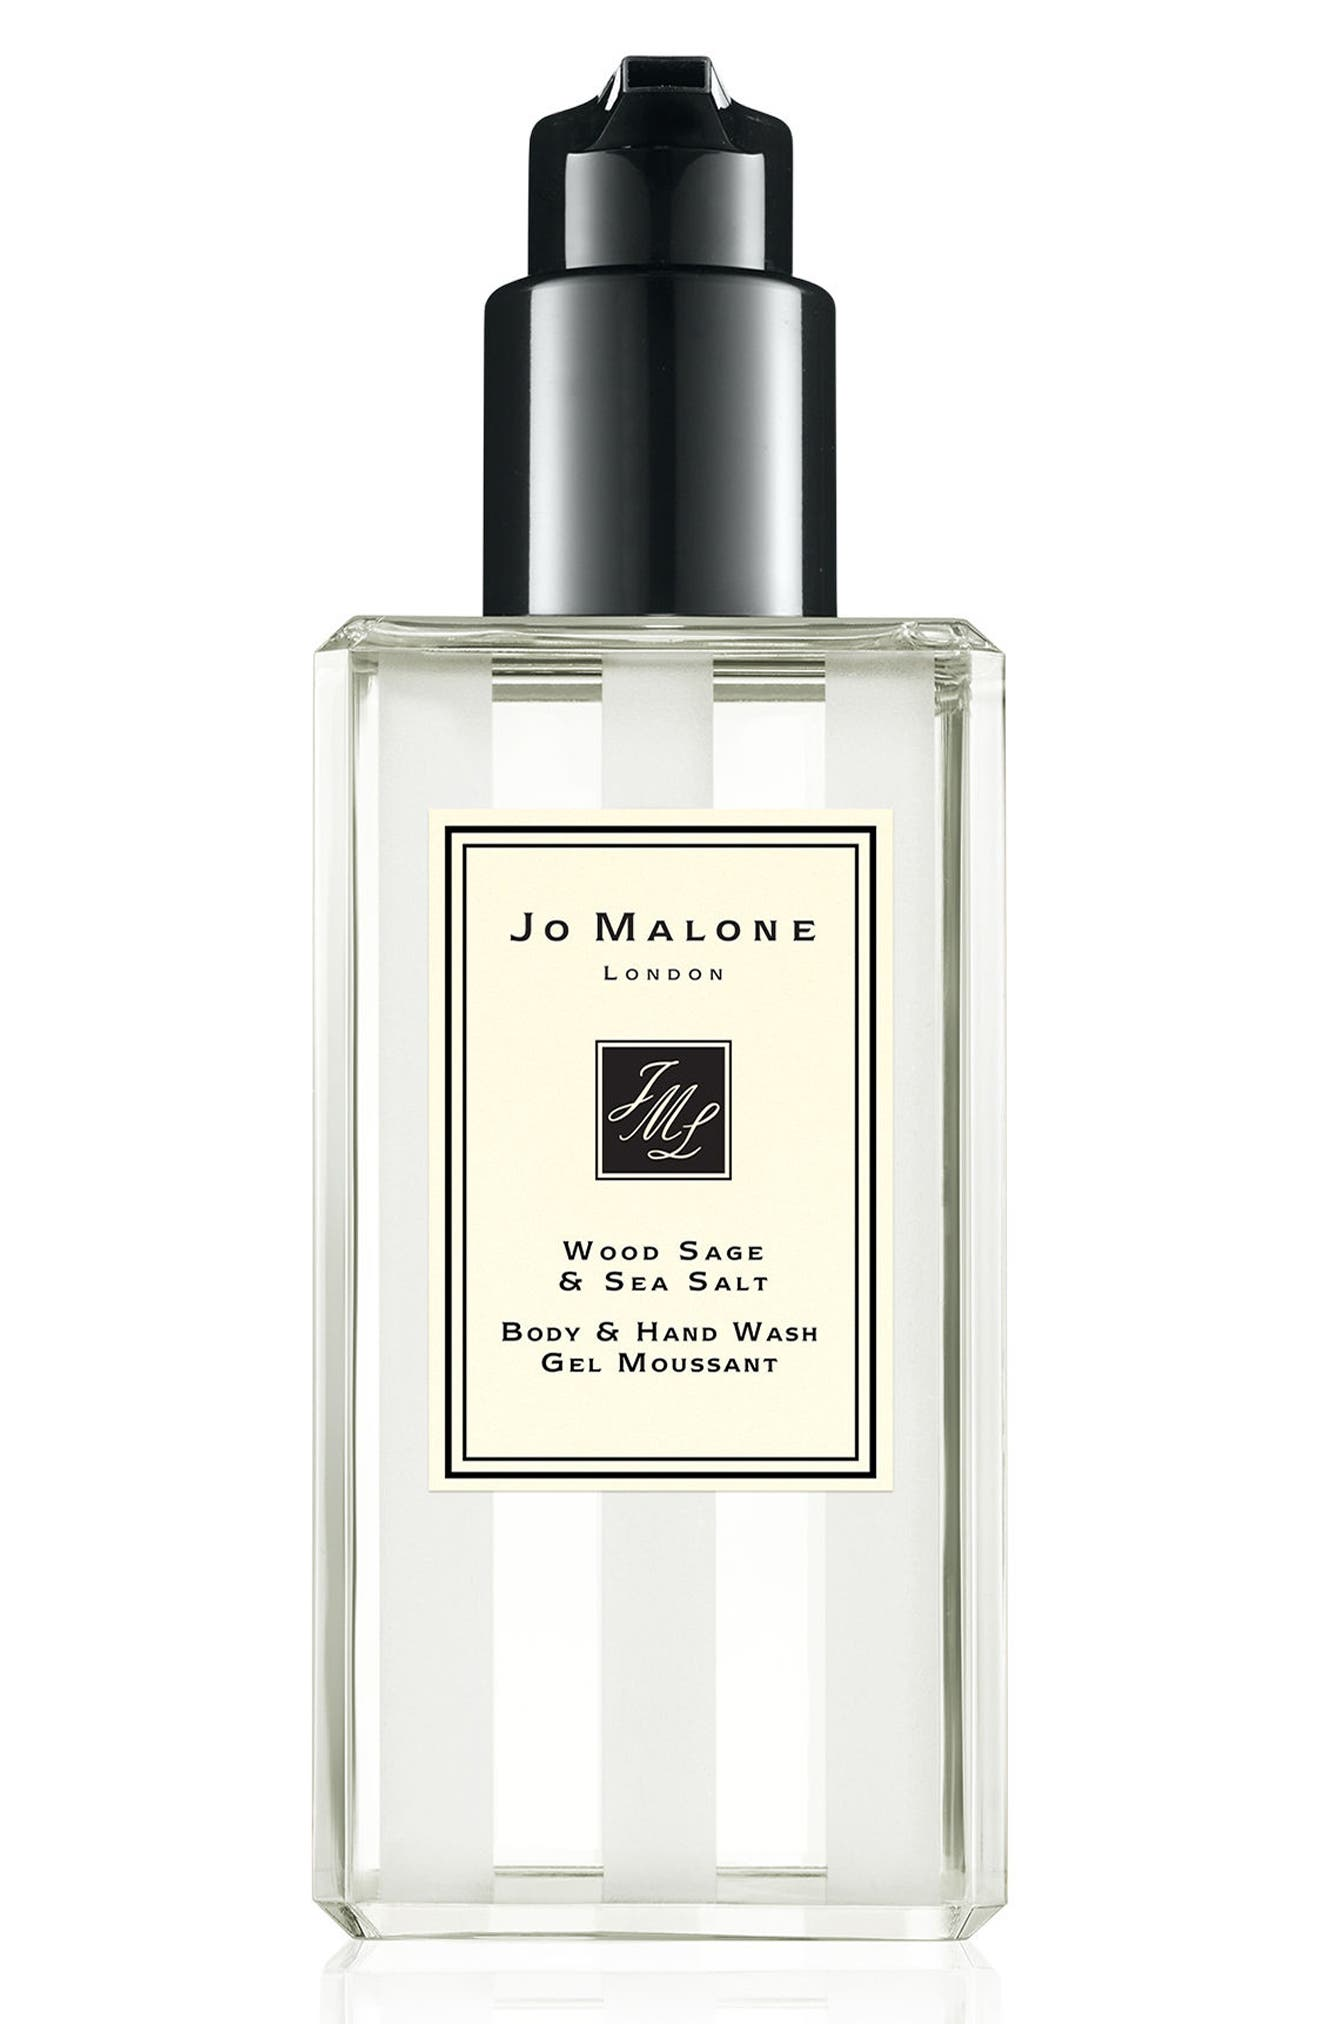 Jo Malone London™ 'Wood Sage & Sea Salt' Body & Hand Wash